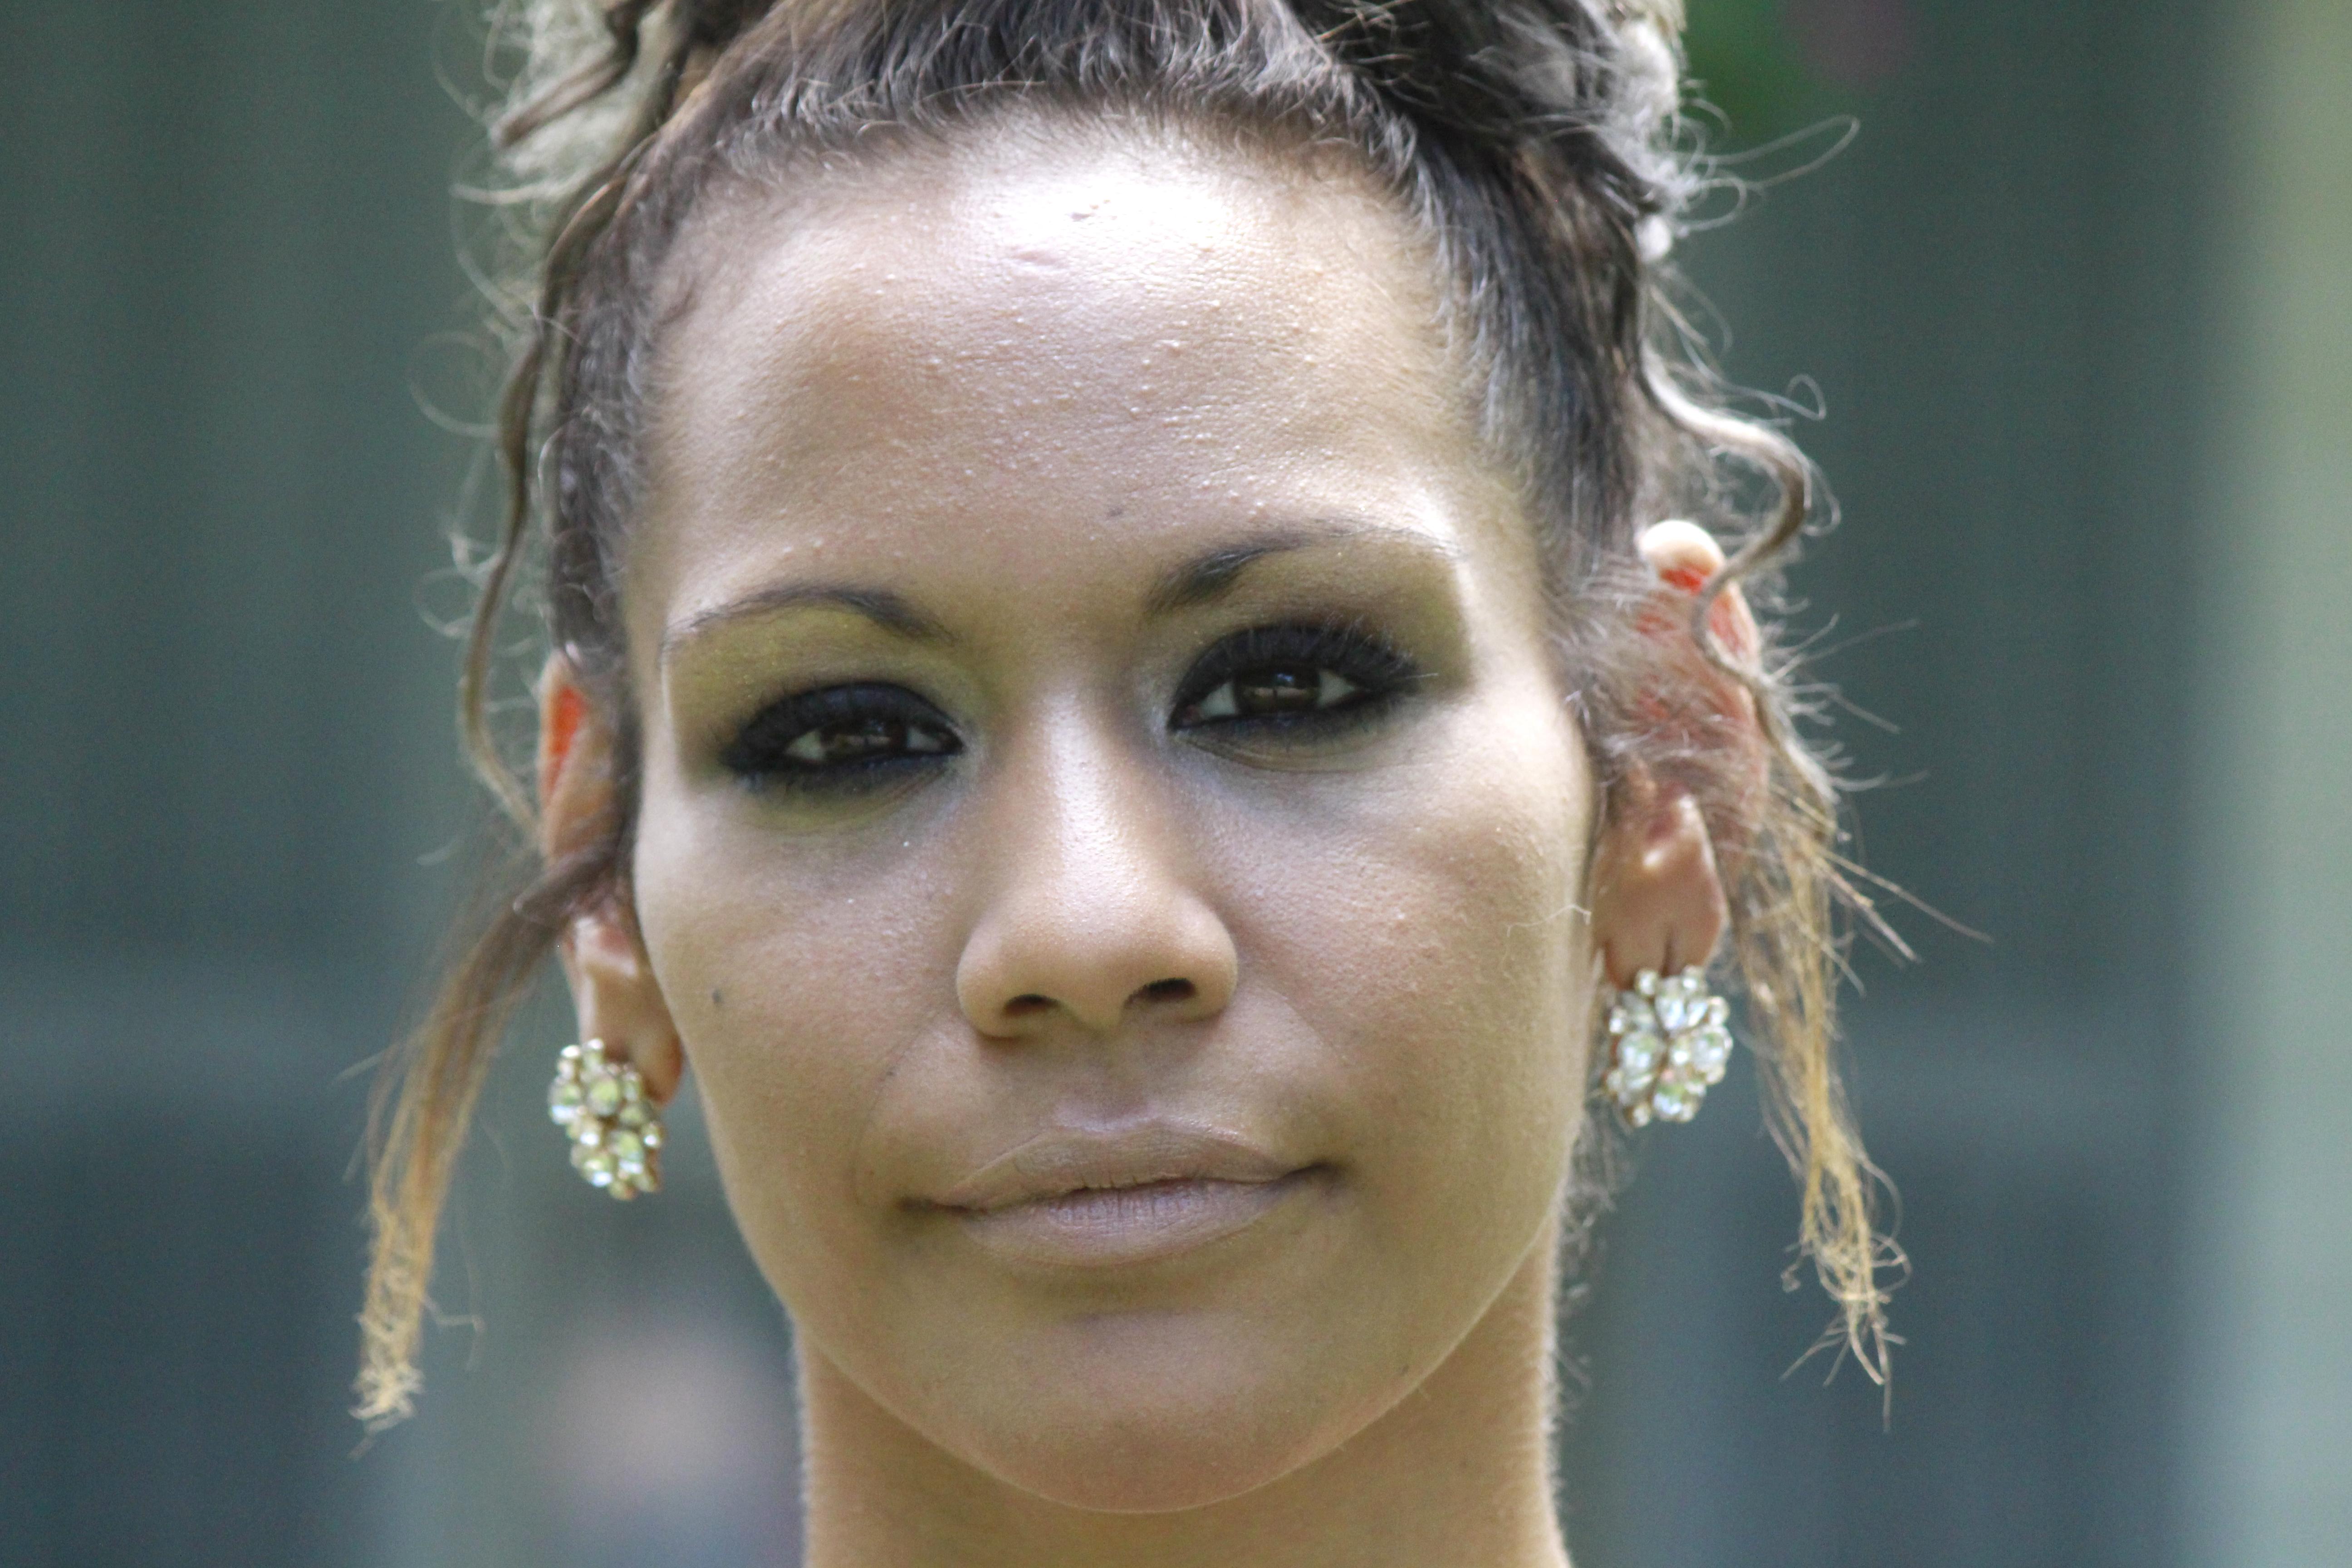 Sex trafficking victim dissociative disorder person